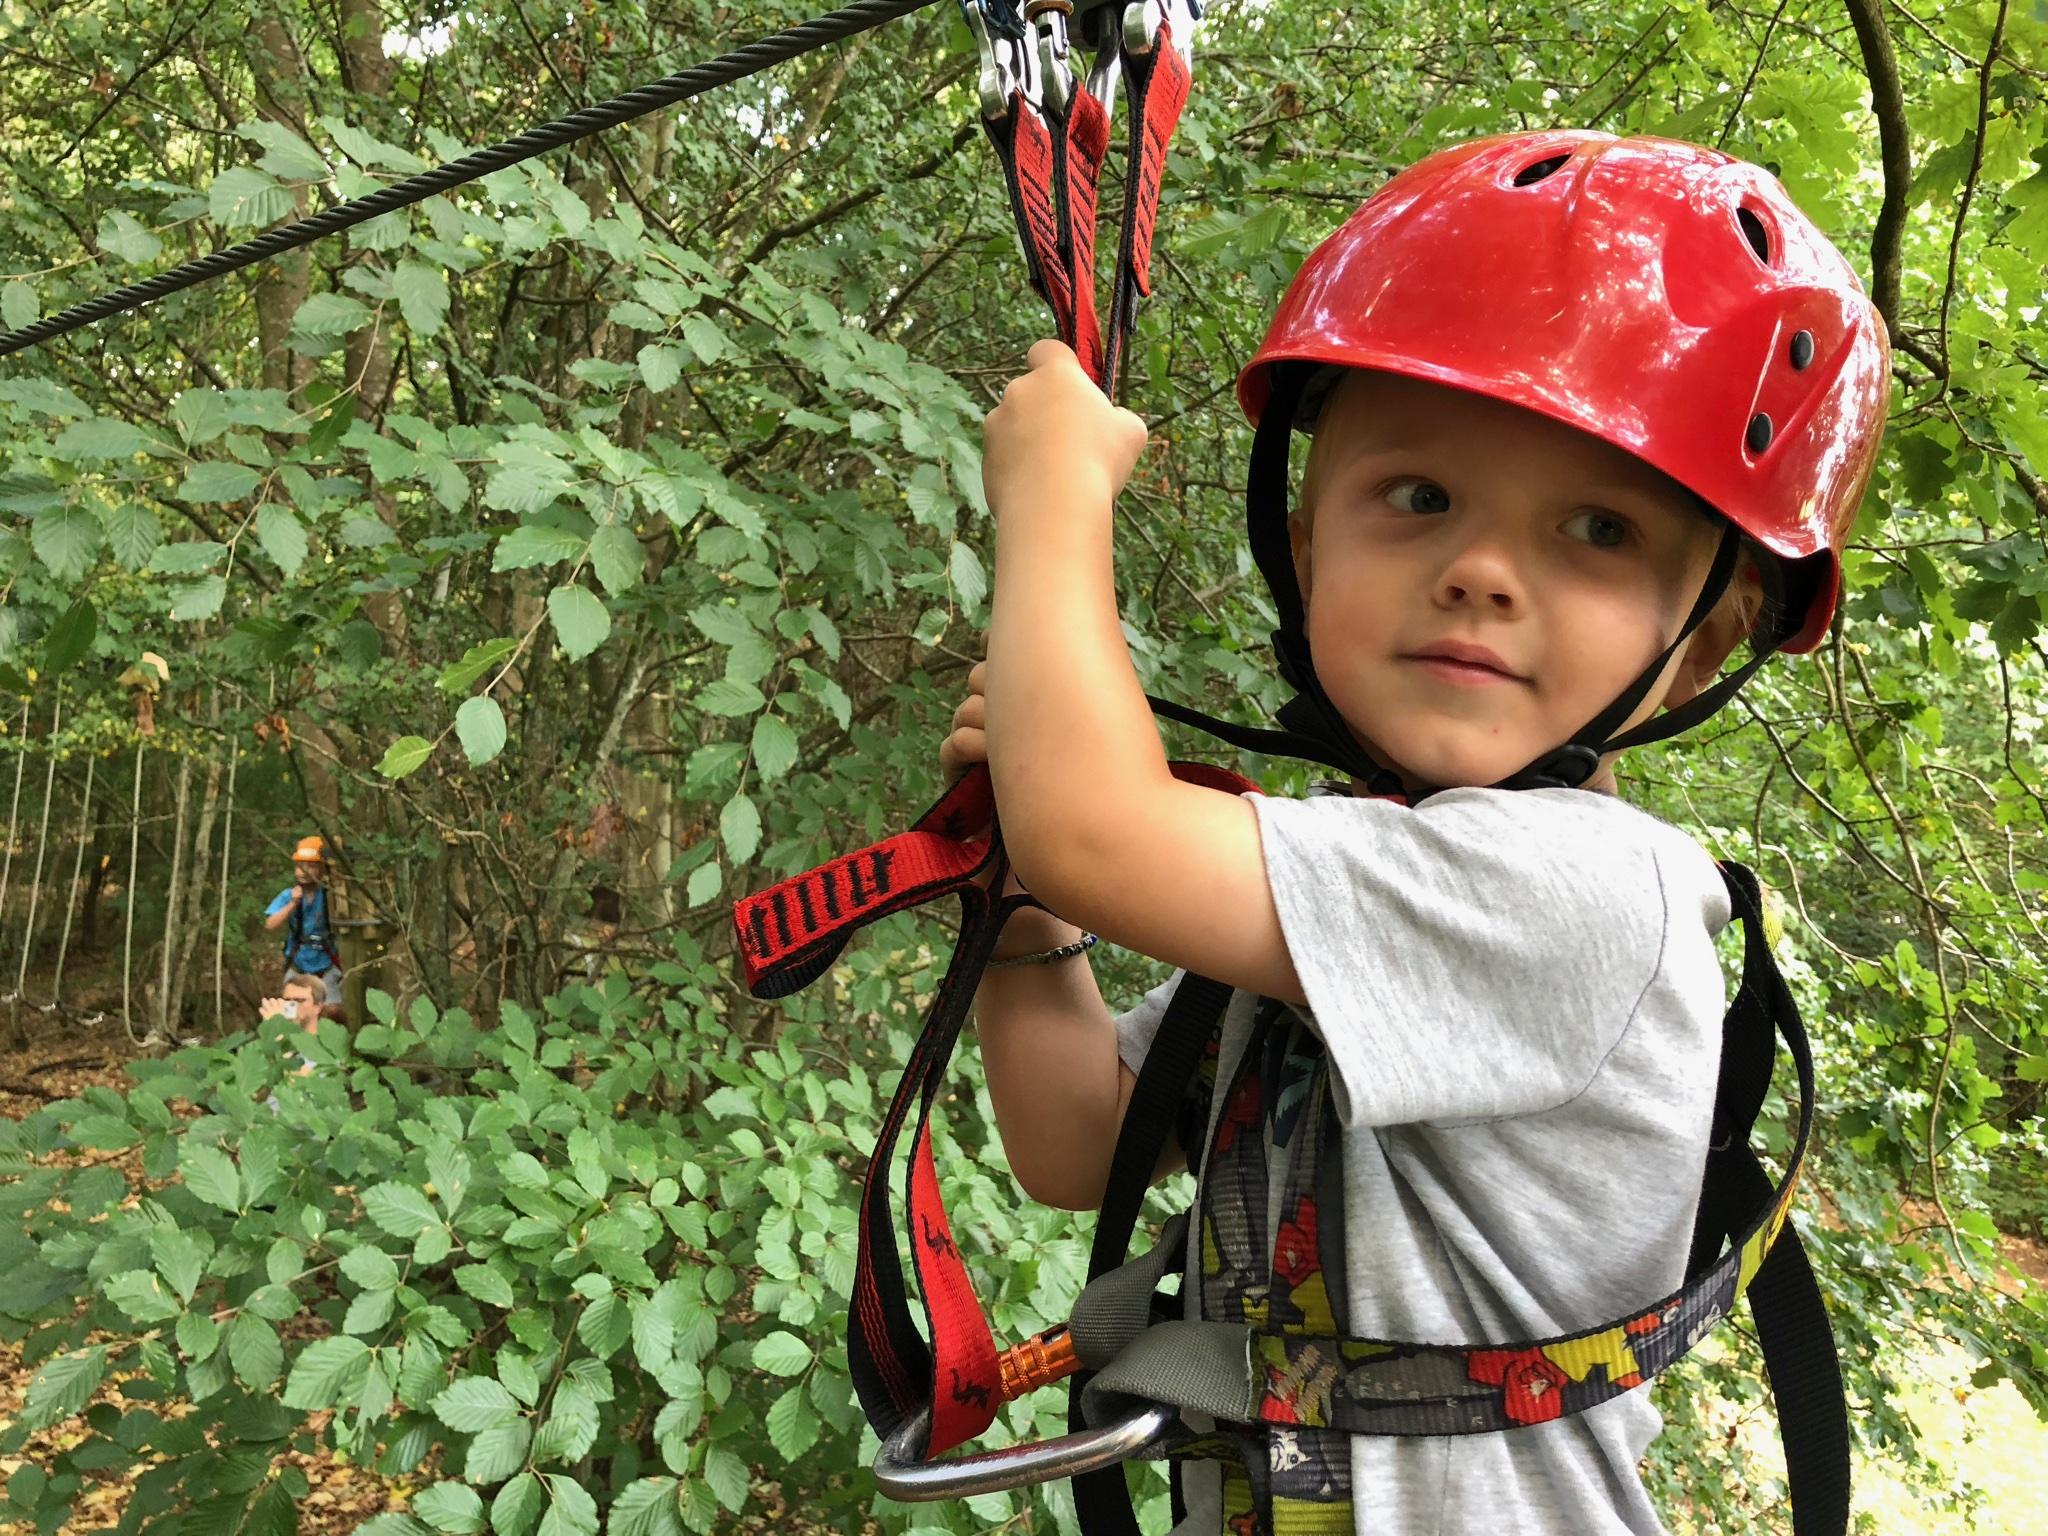 En sej gut, som nu skal prøve svævebanen i skoven. Foto: Stine Nyberg